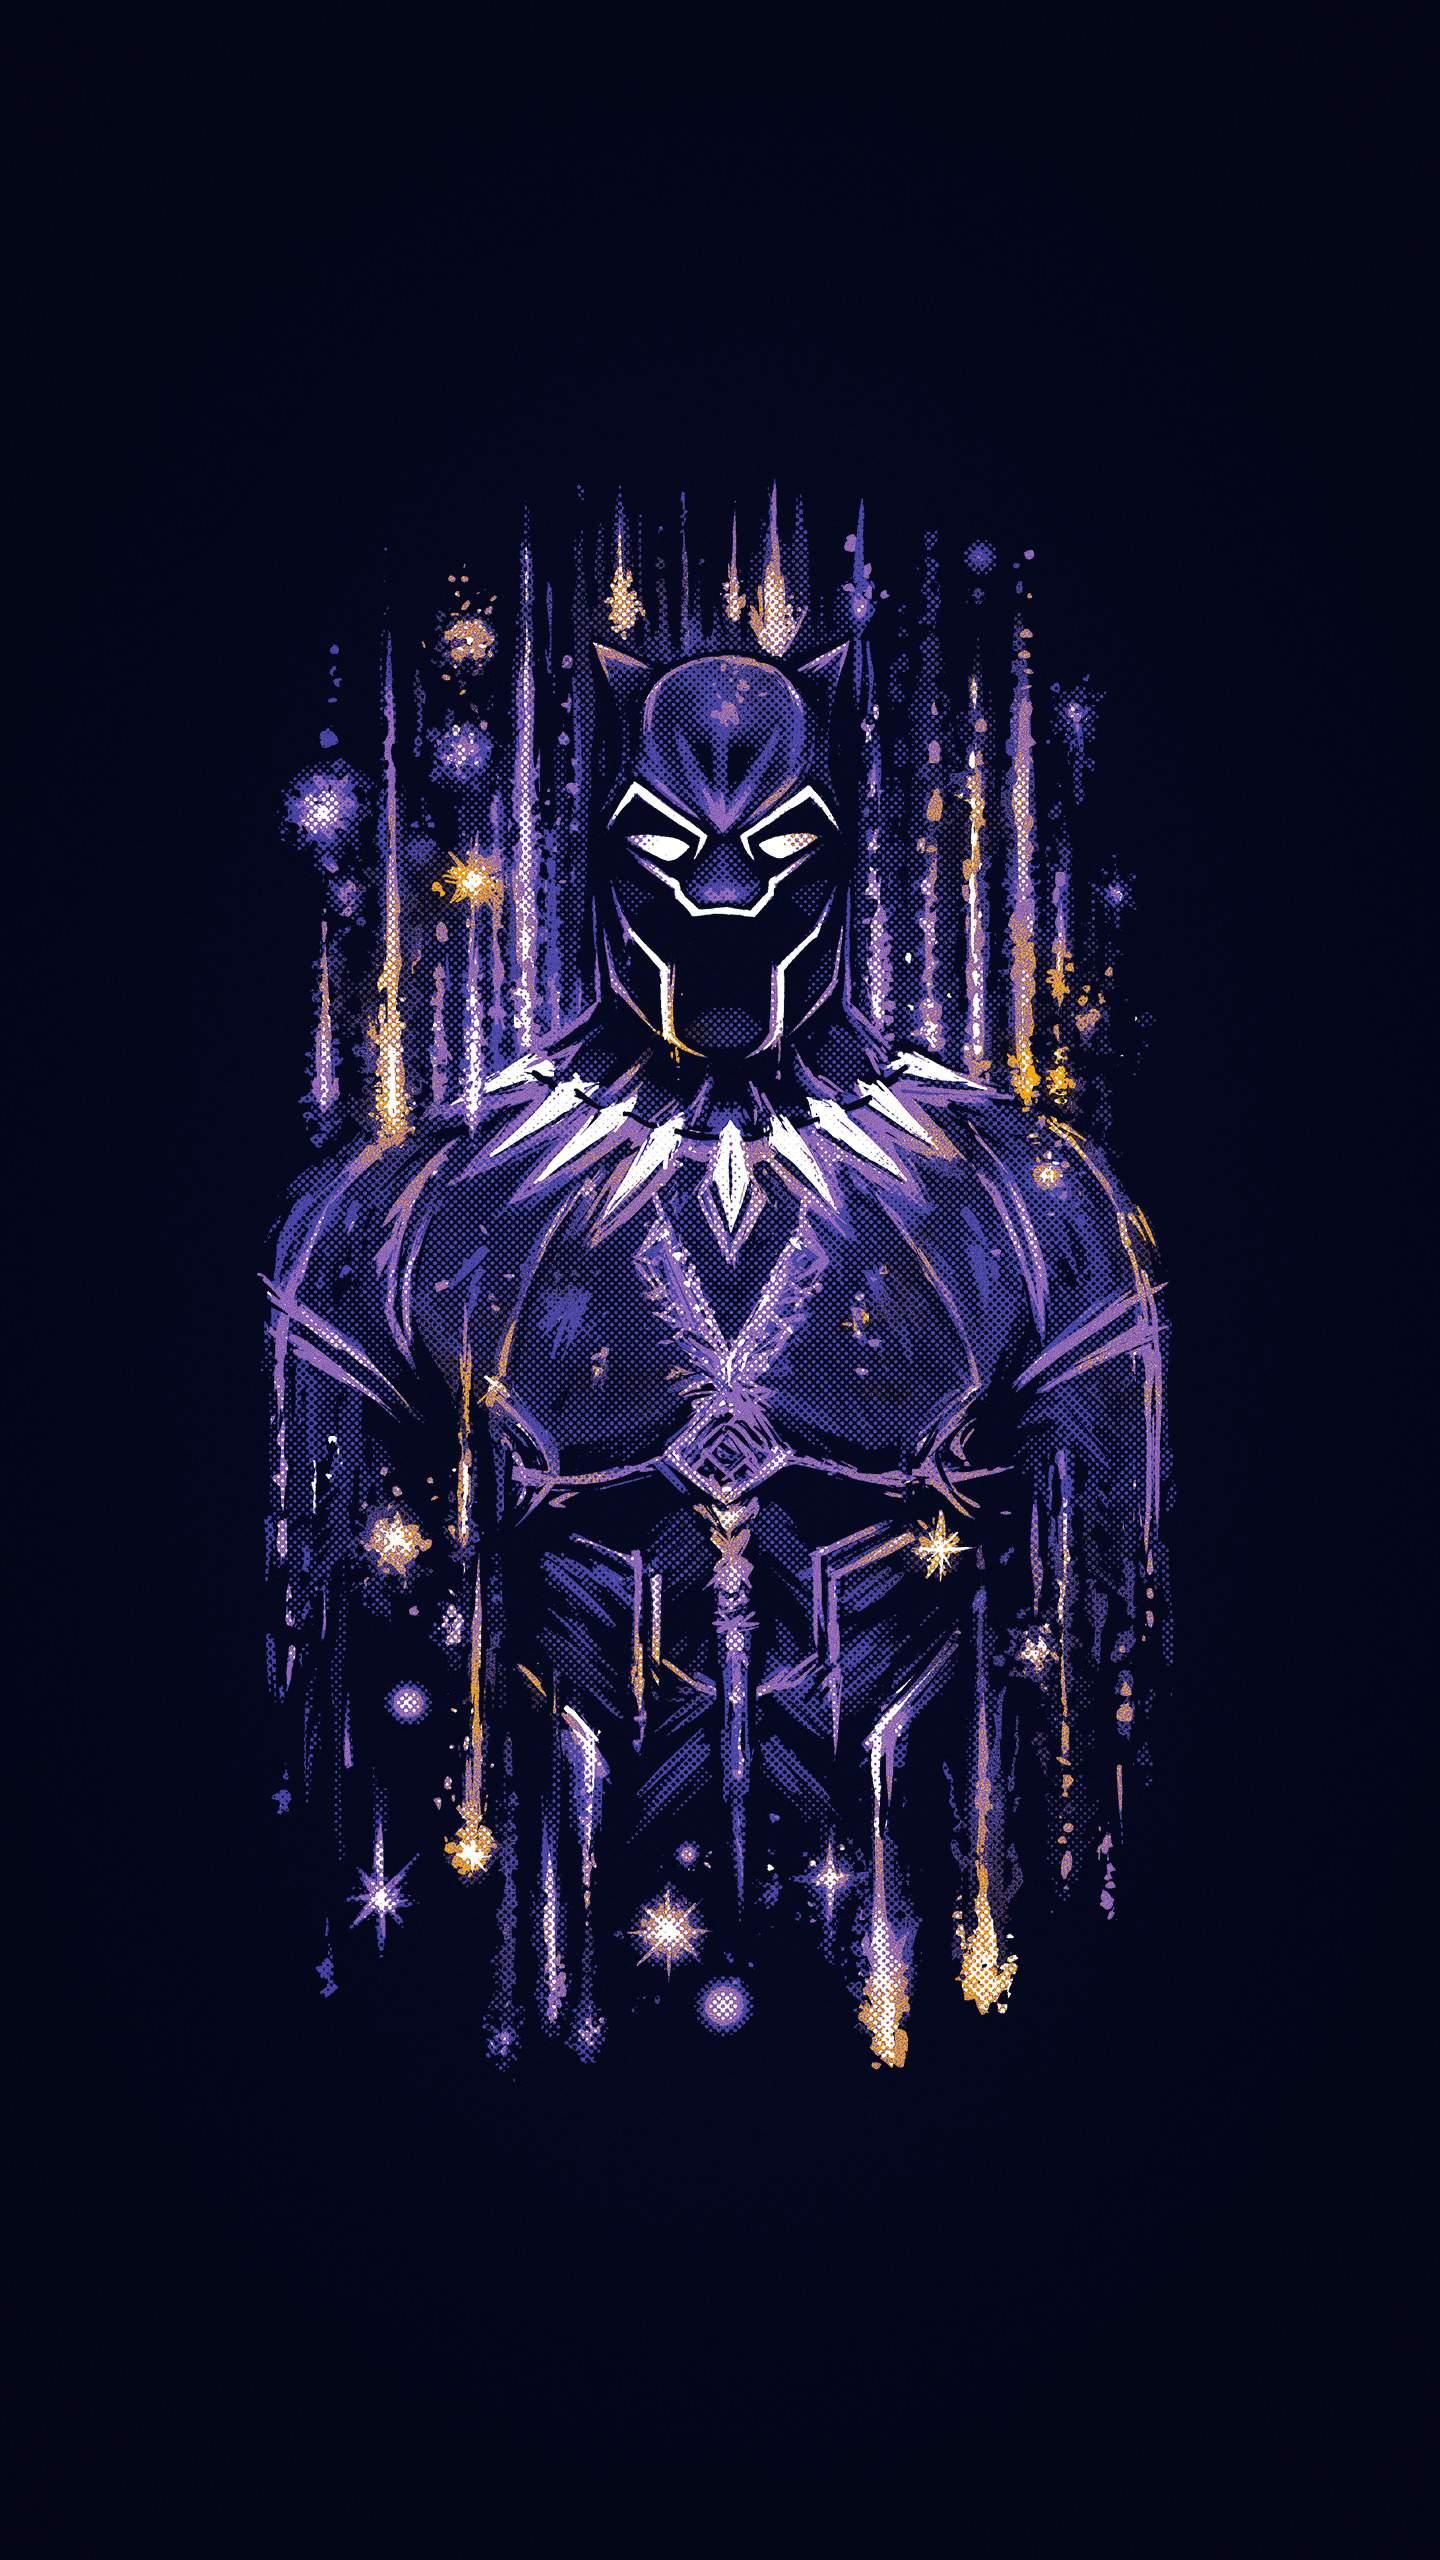 Black Panther Wakanda Artwork iPhone Wallpaper